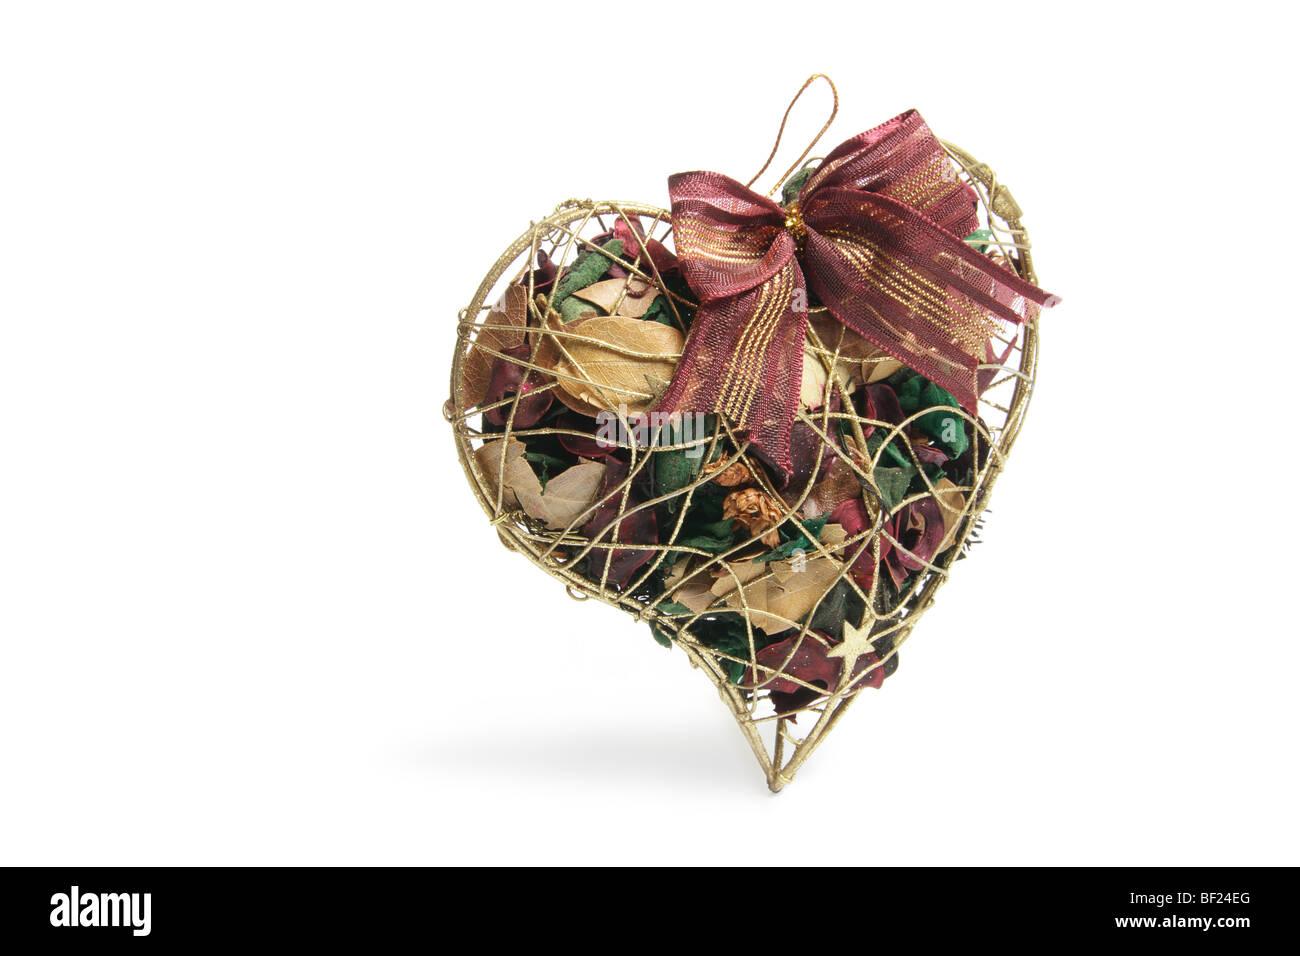 Potpourri in Heart-Shaped Box - Stock Image